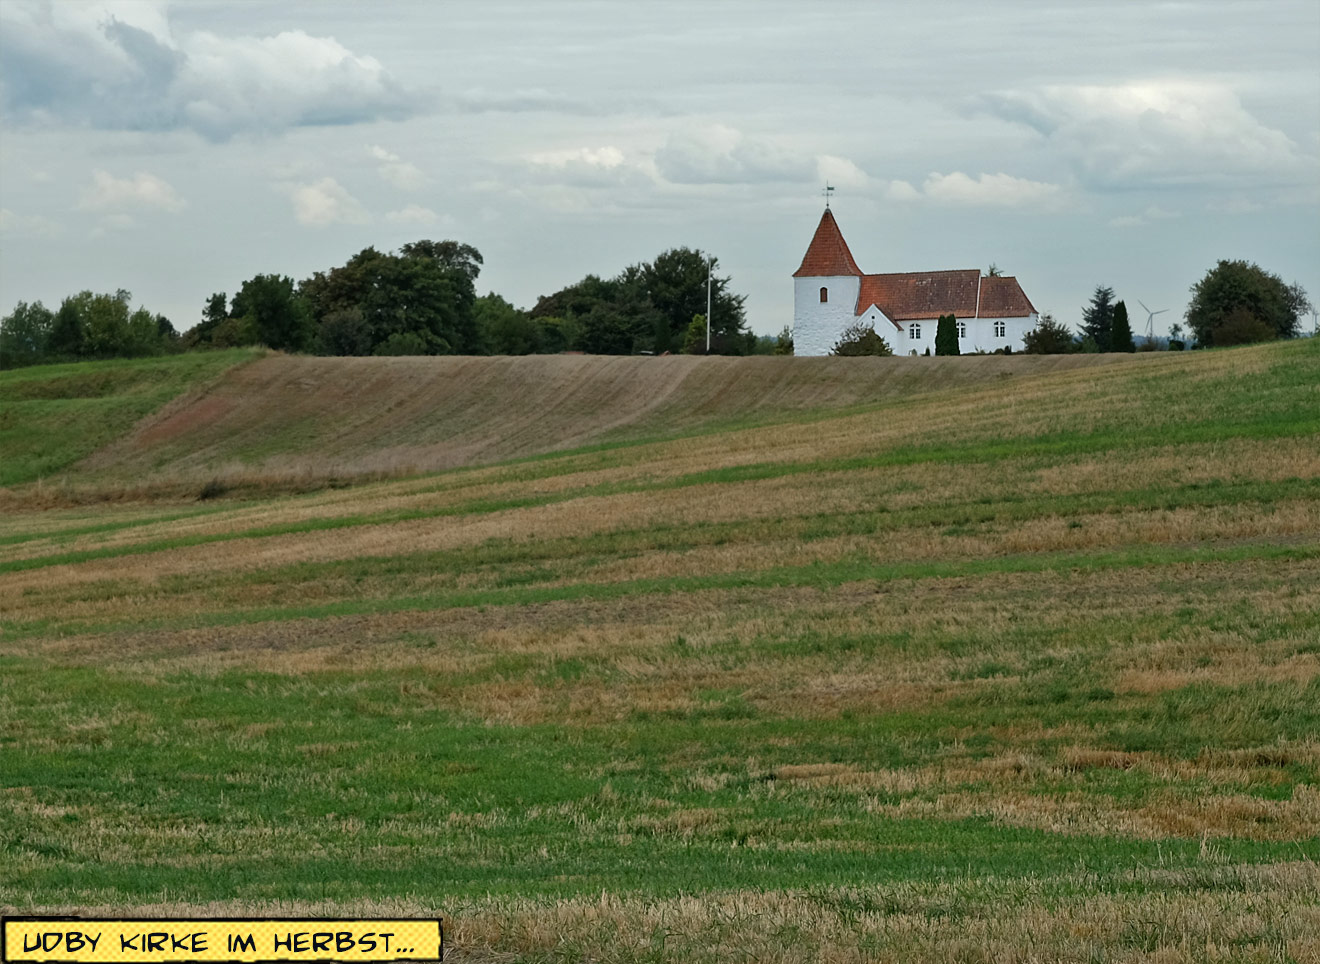 Udby Kirke Dänemark